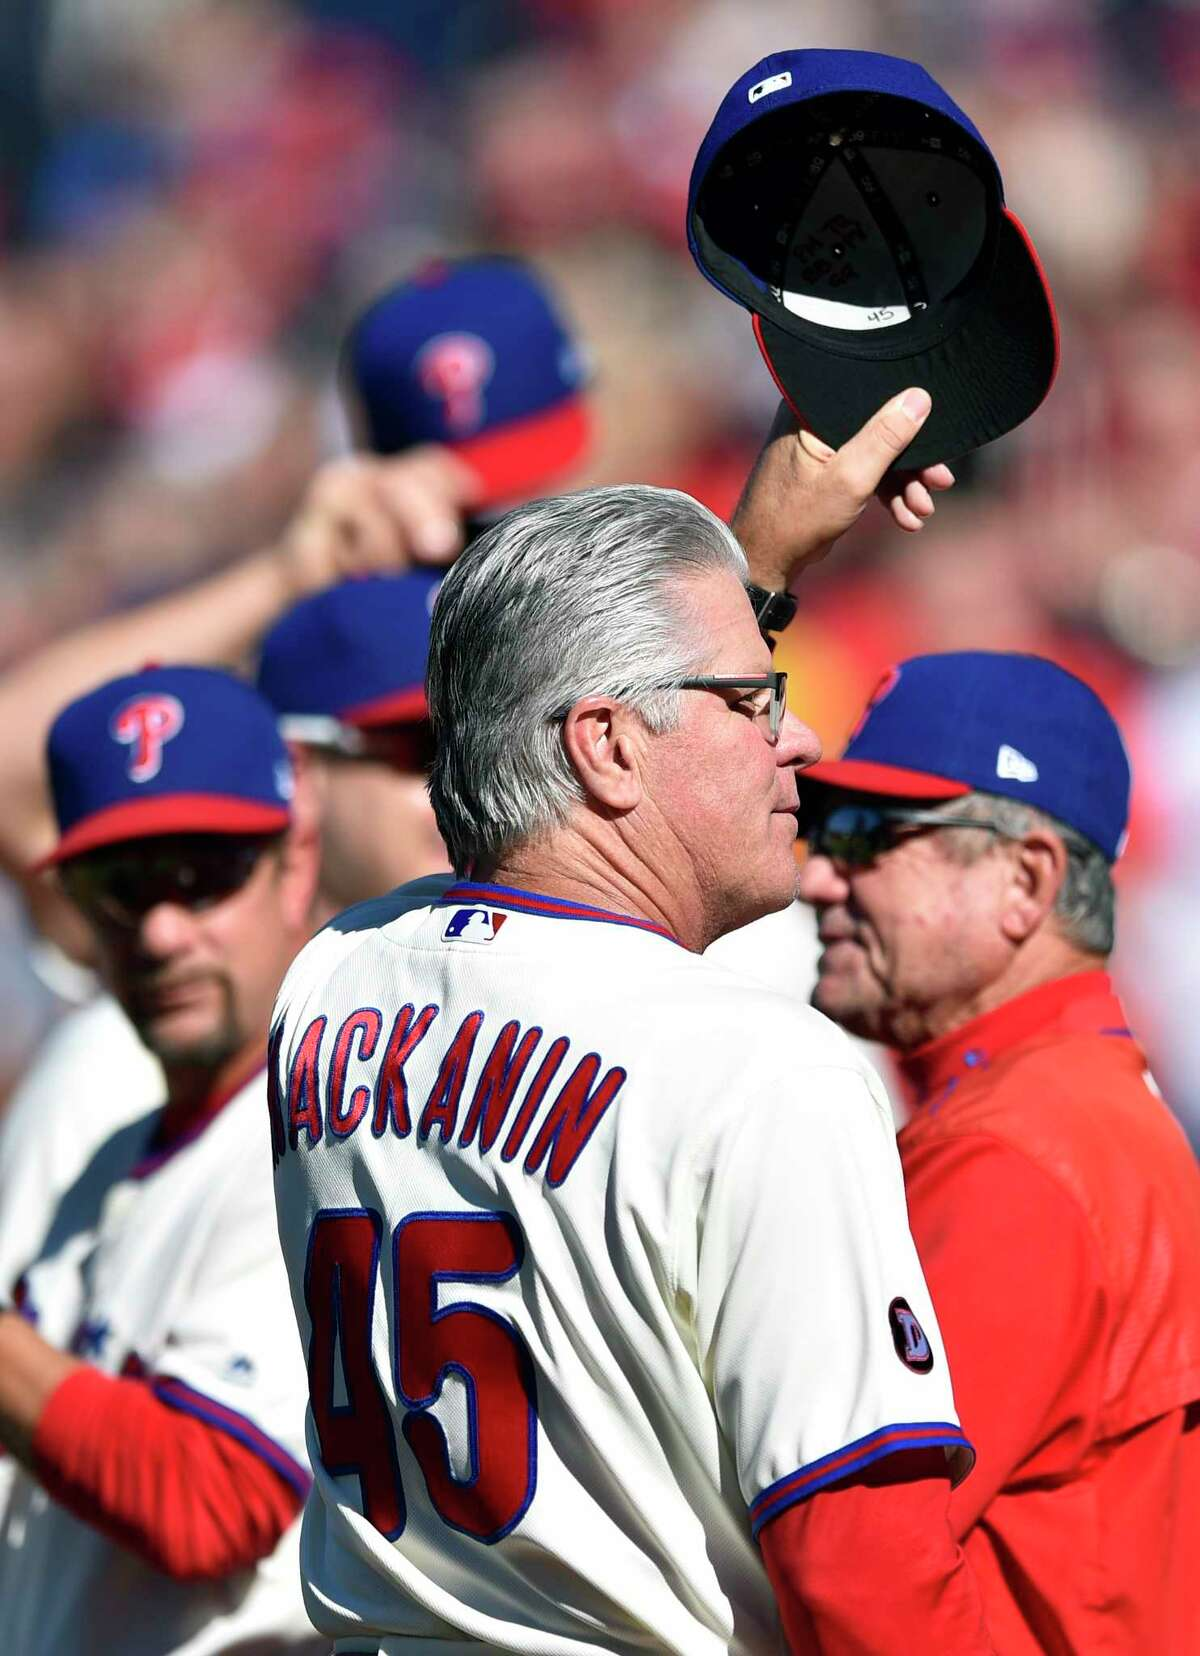 Philadelphia Phillies manager Pete Mackanin tips his cap to the crowd prior to a baseballgame against the New York Mets, Sunday, Oct. 1, 2017, in Philadelphia. (AP Photo/Derik Hamilton) ORG XMIT: PXS101